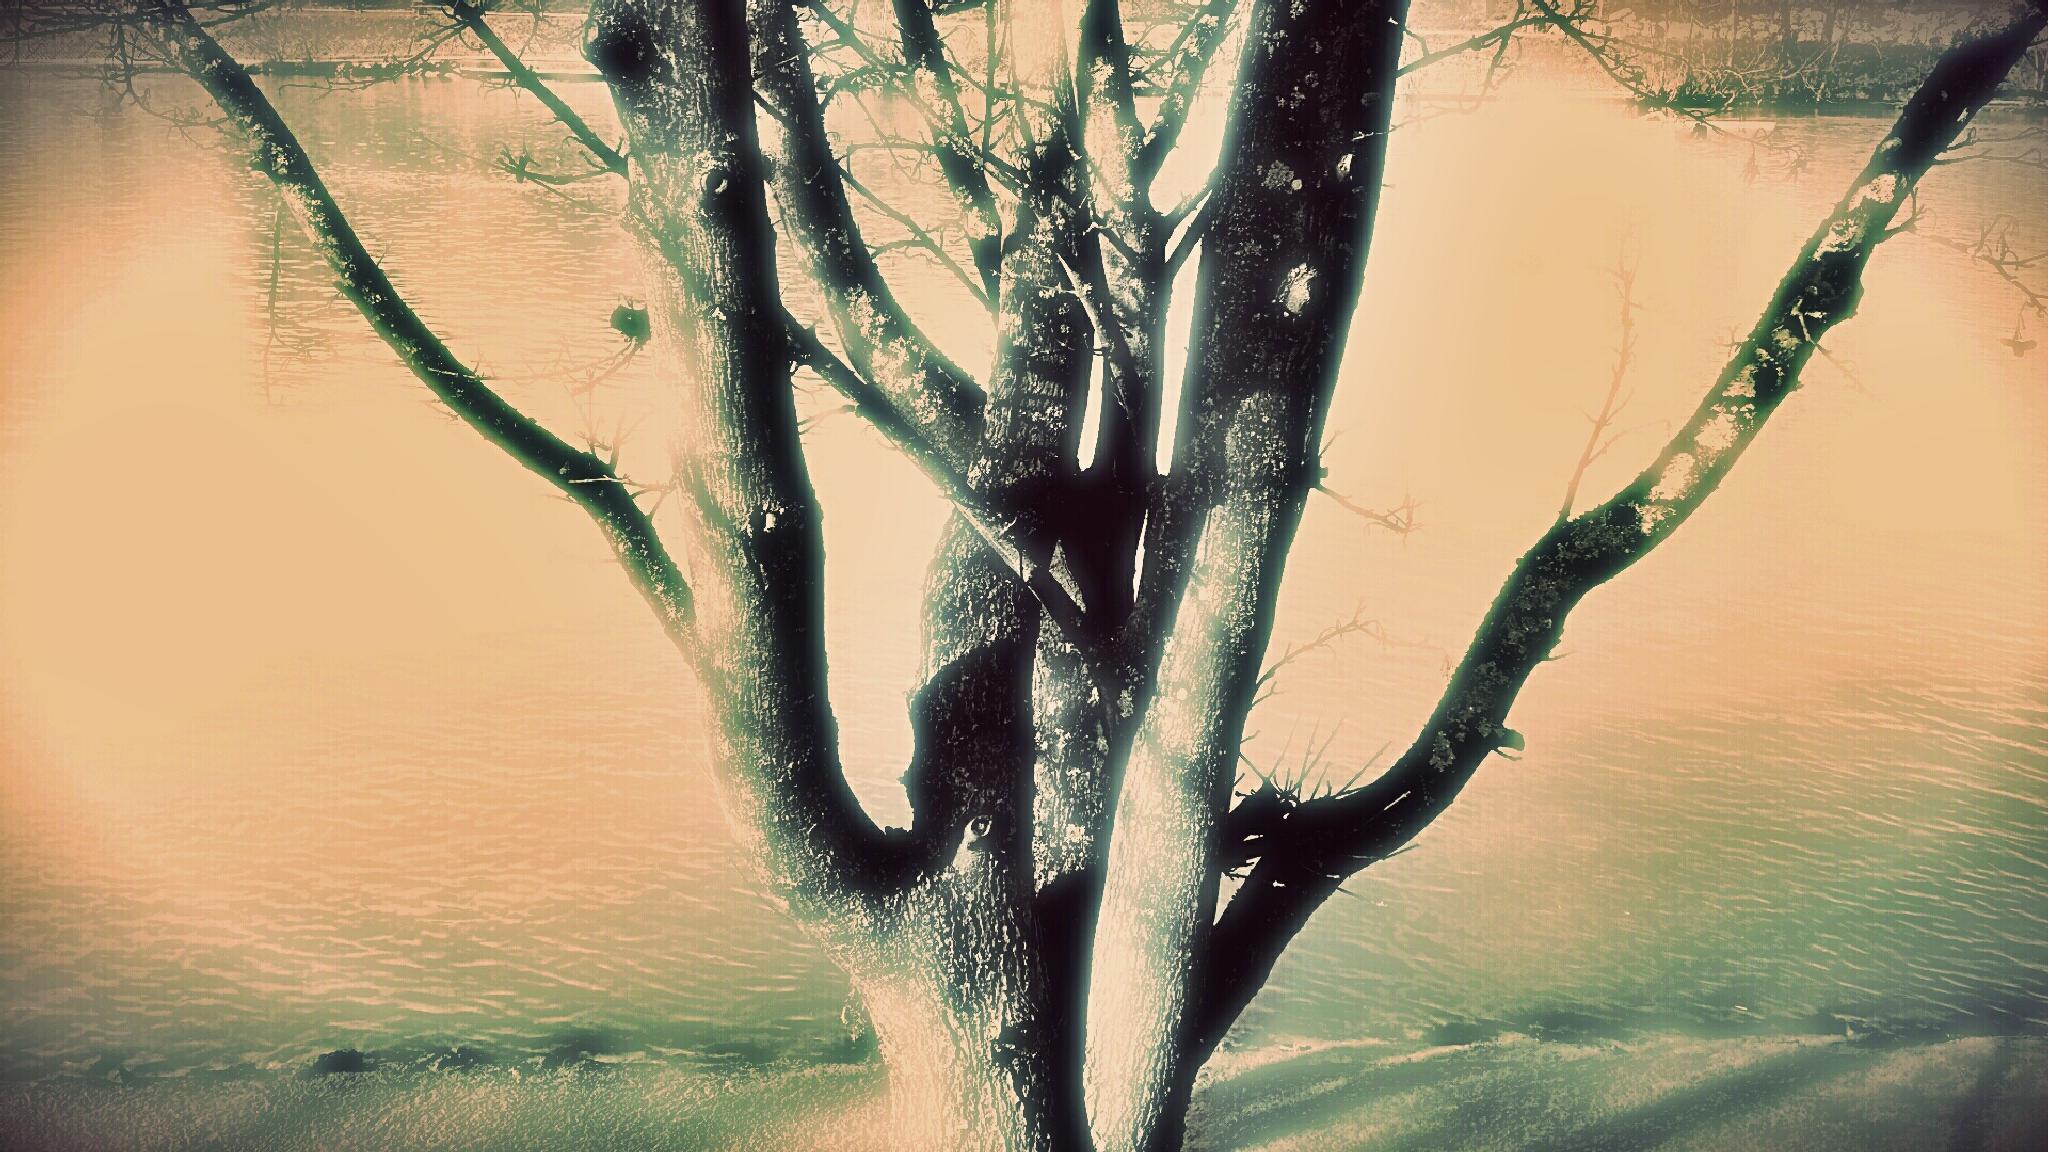 Wonder tree by Blueanna